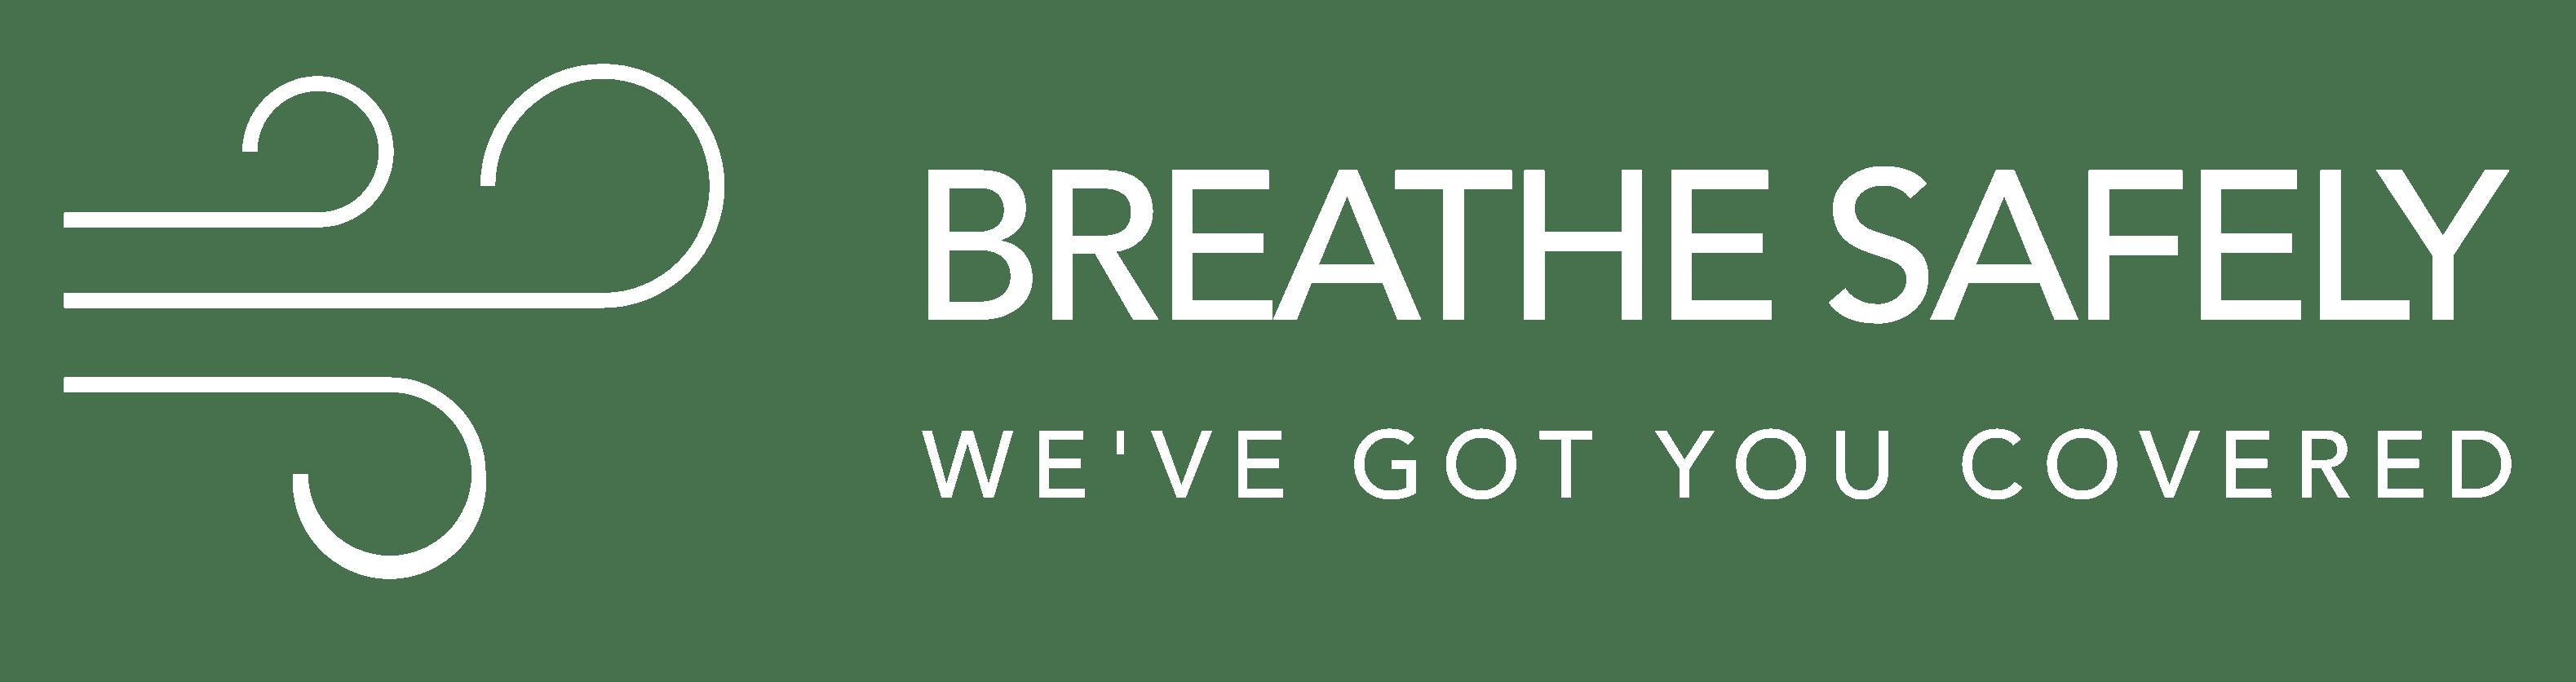 breathe-safely-white-background